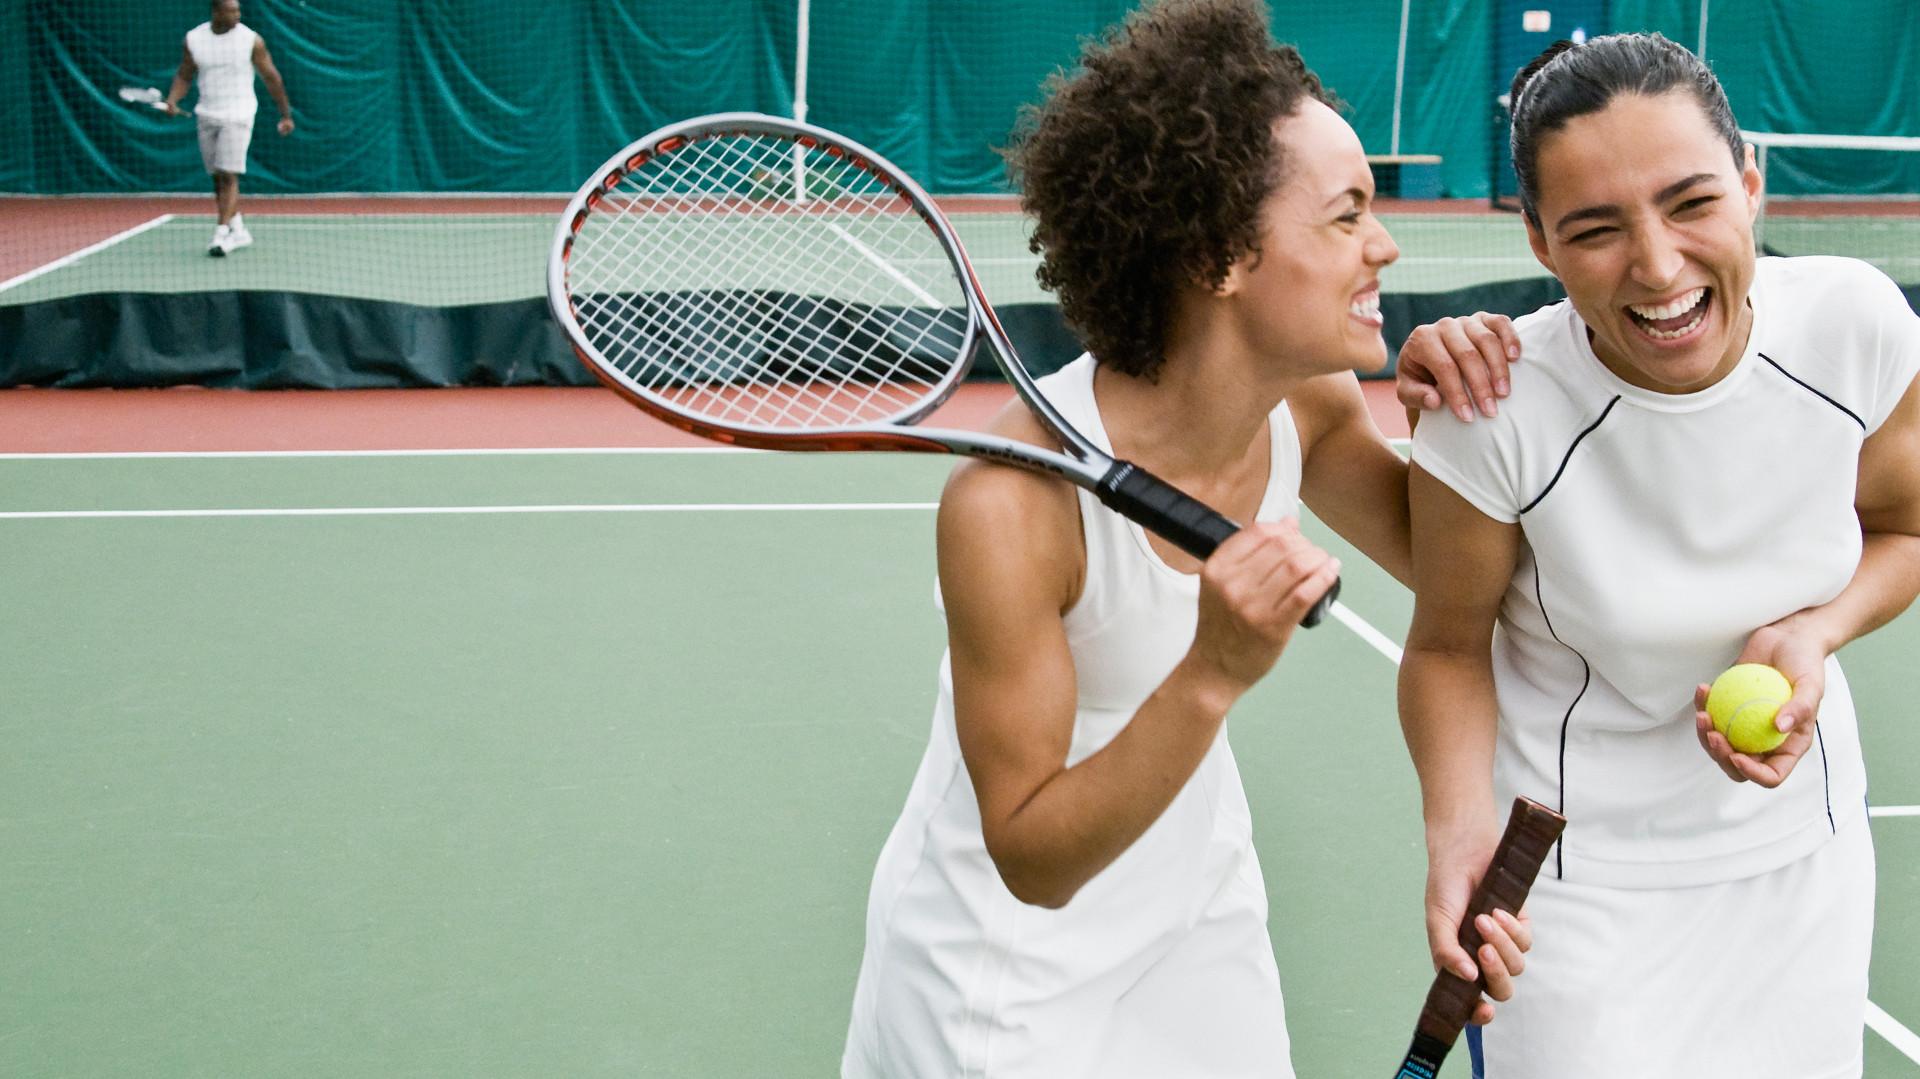 Tennis in Pairs